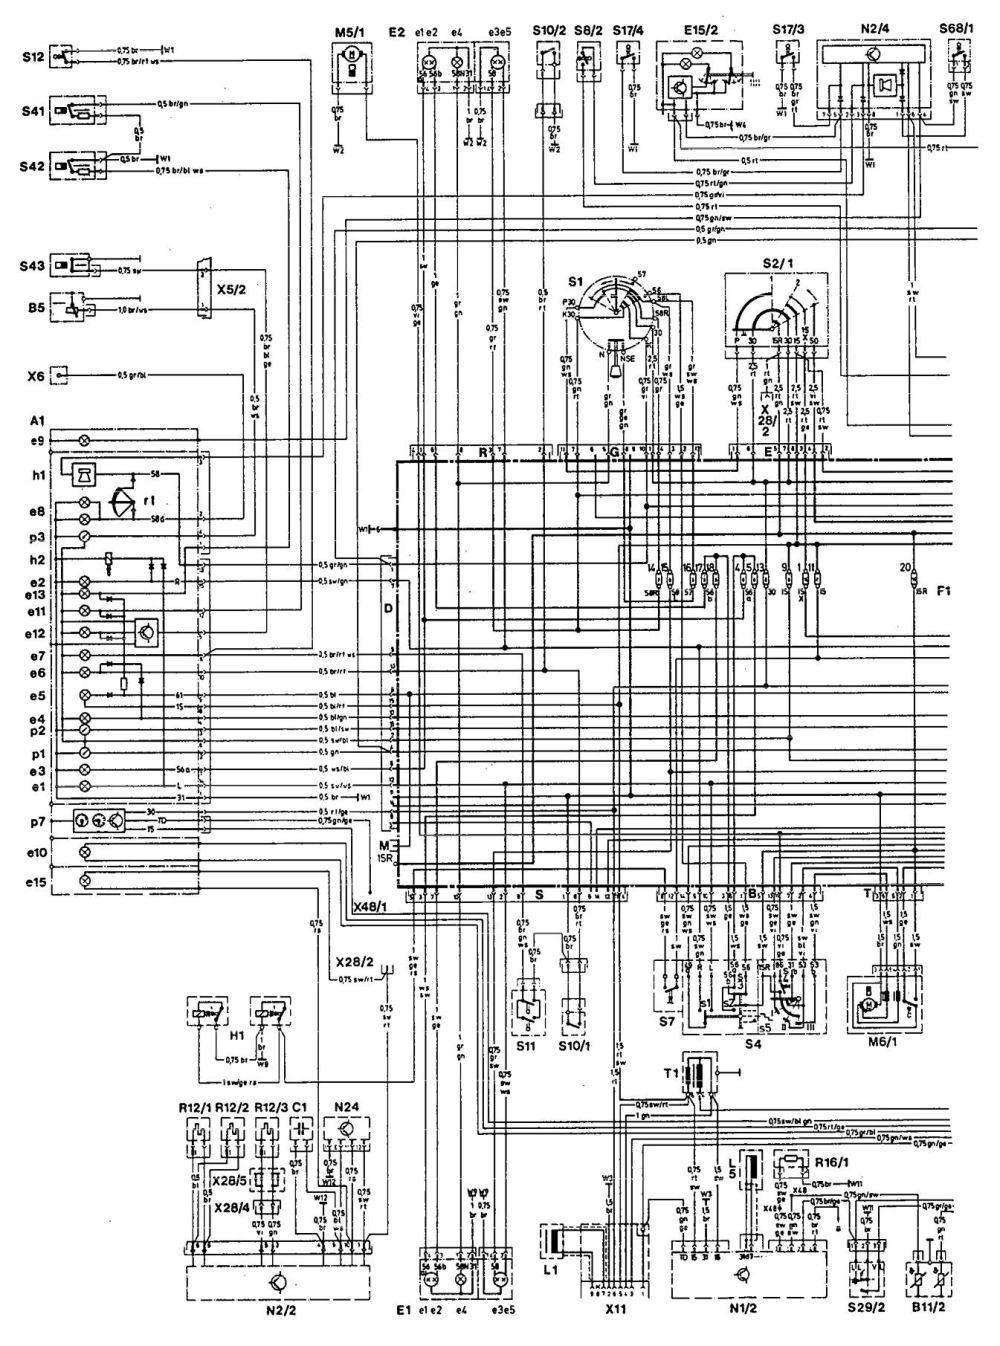 medium resolution of wiring diagram hose engineheater mercedes smart fortwo fuse box layout mercedes benz 190e wiring diagram charging